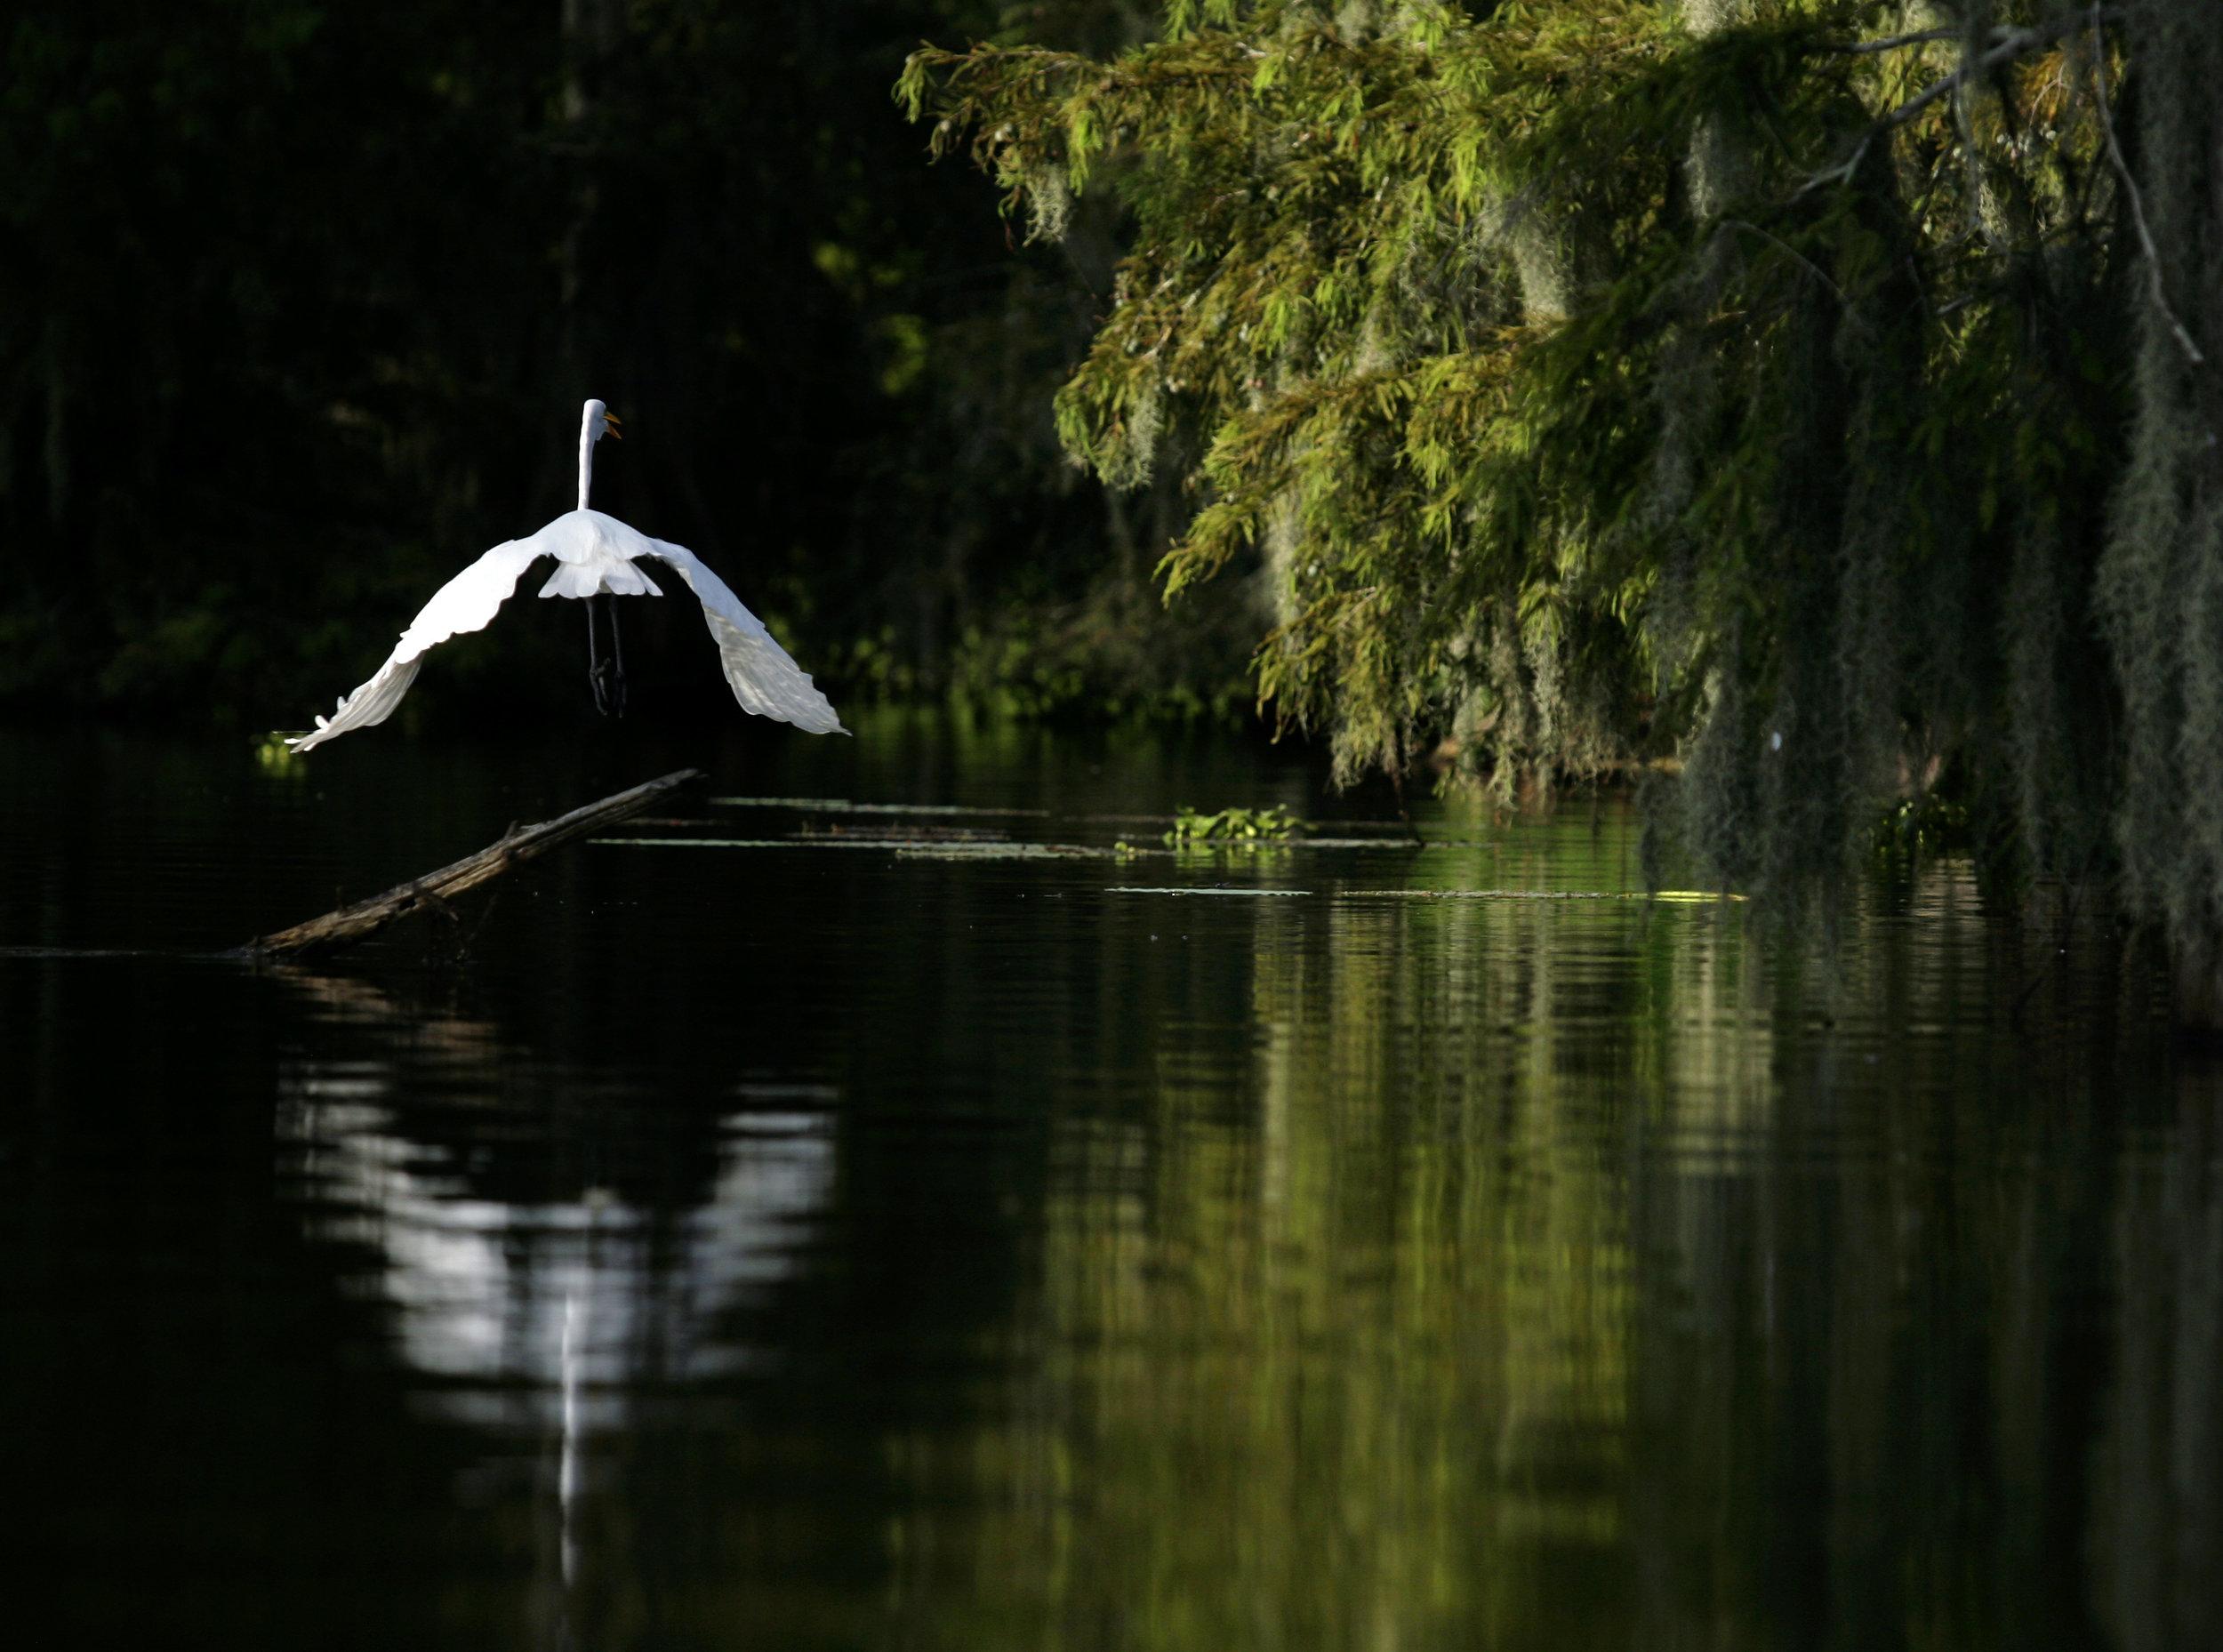 An egret takes flight at Lake Martin on Saturday, August 16, 2010, near Breaux Bridge, La. (Kevin Martin)